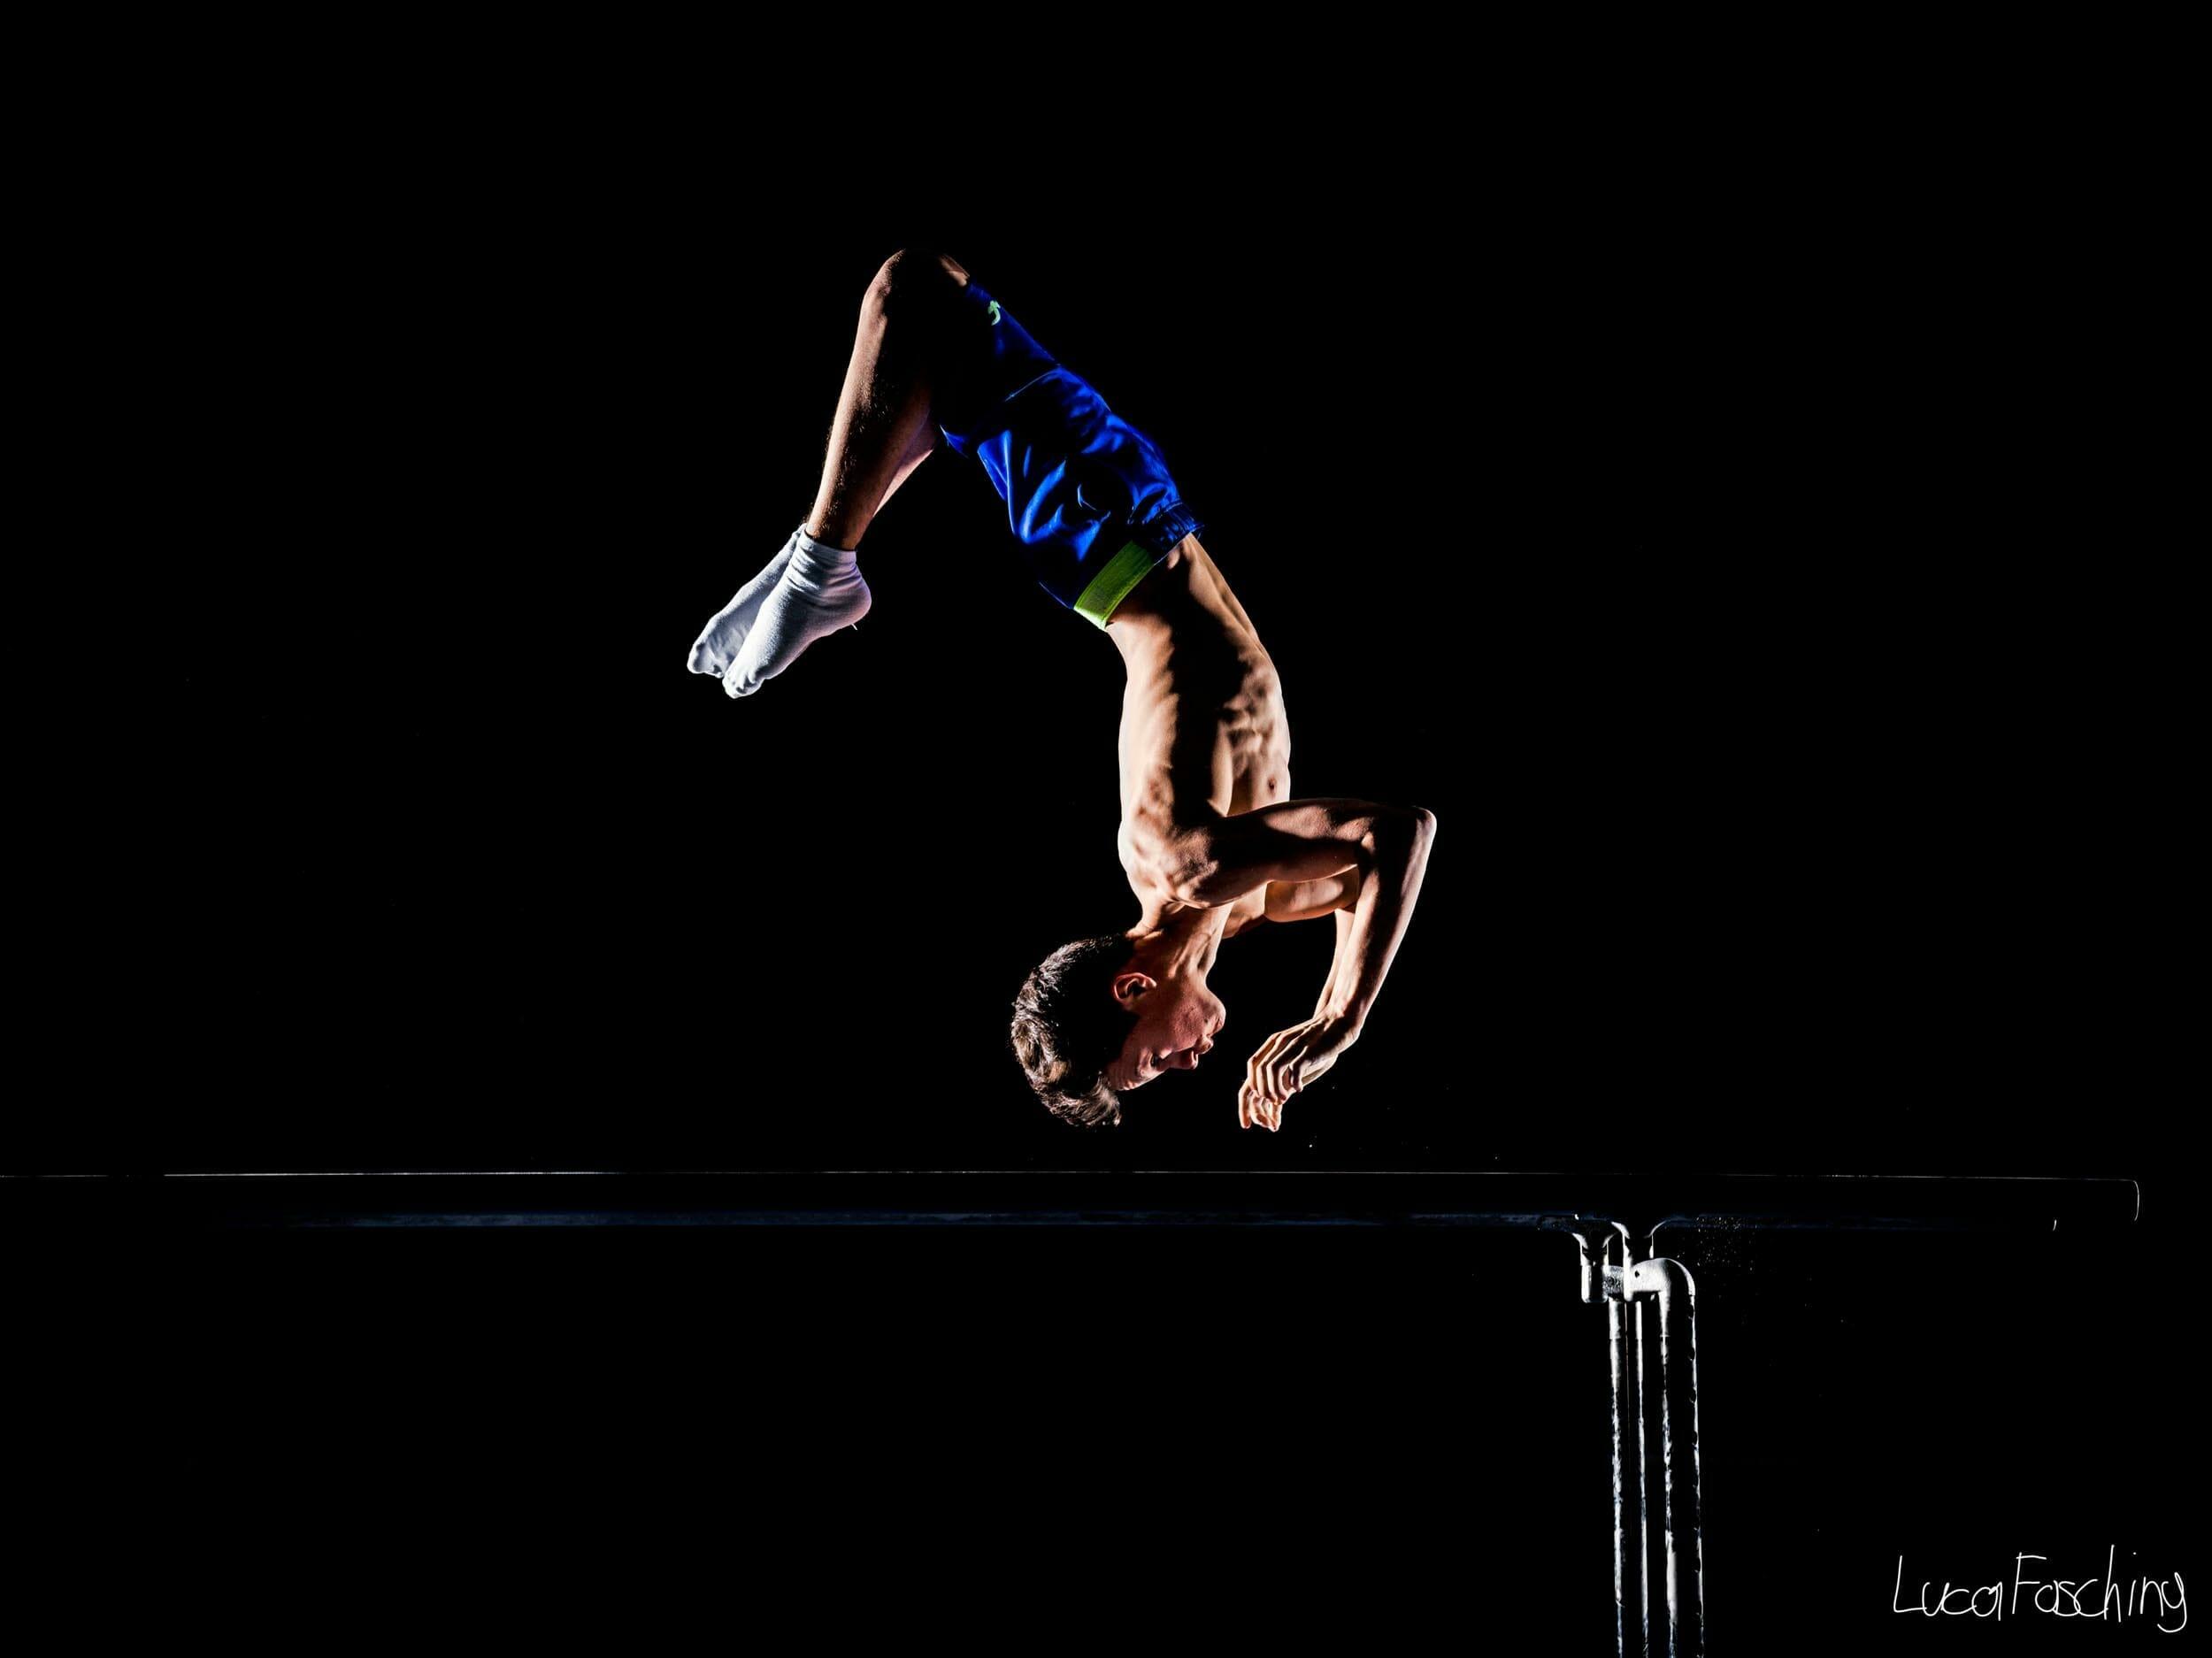 Sportfotograf Luca Fasching fotografierte dieses Bild